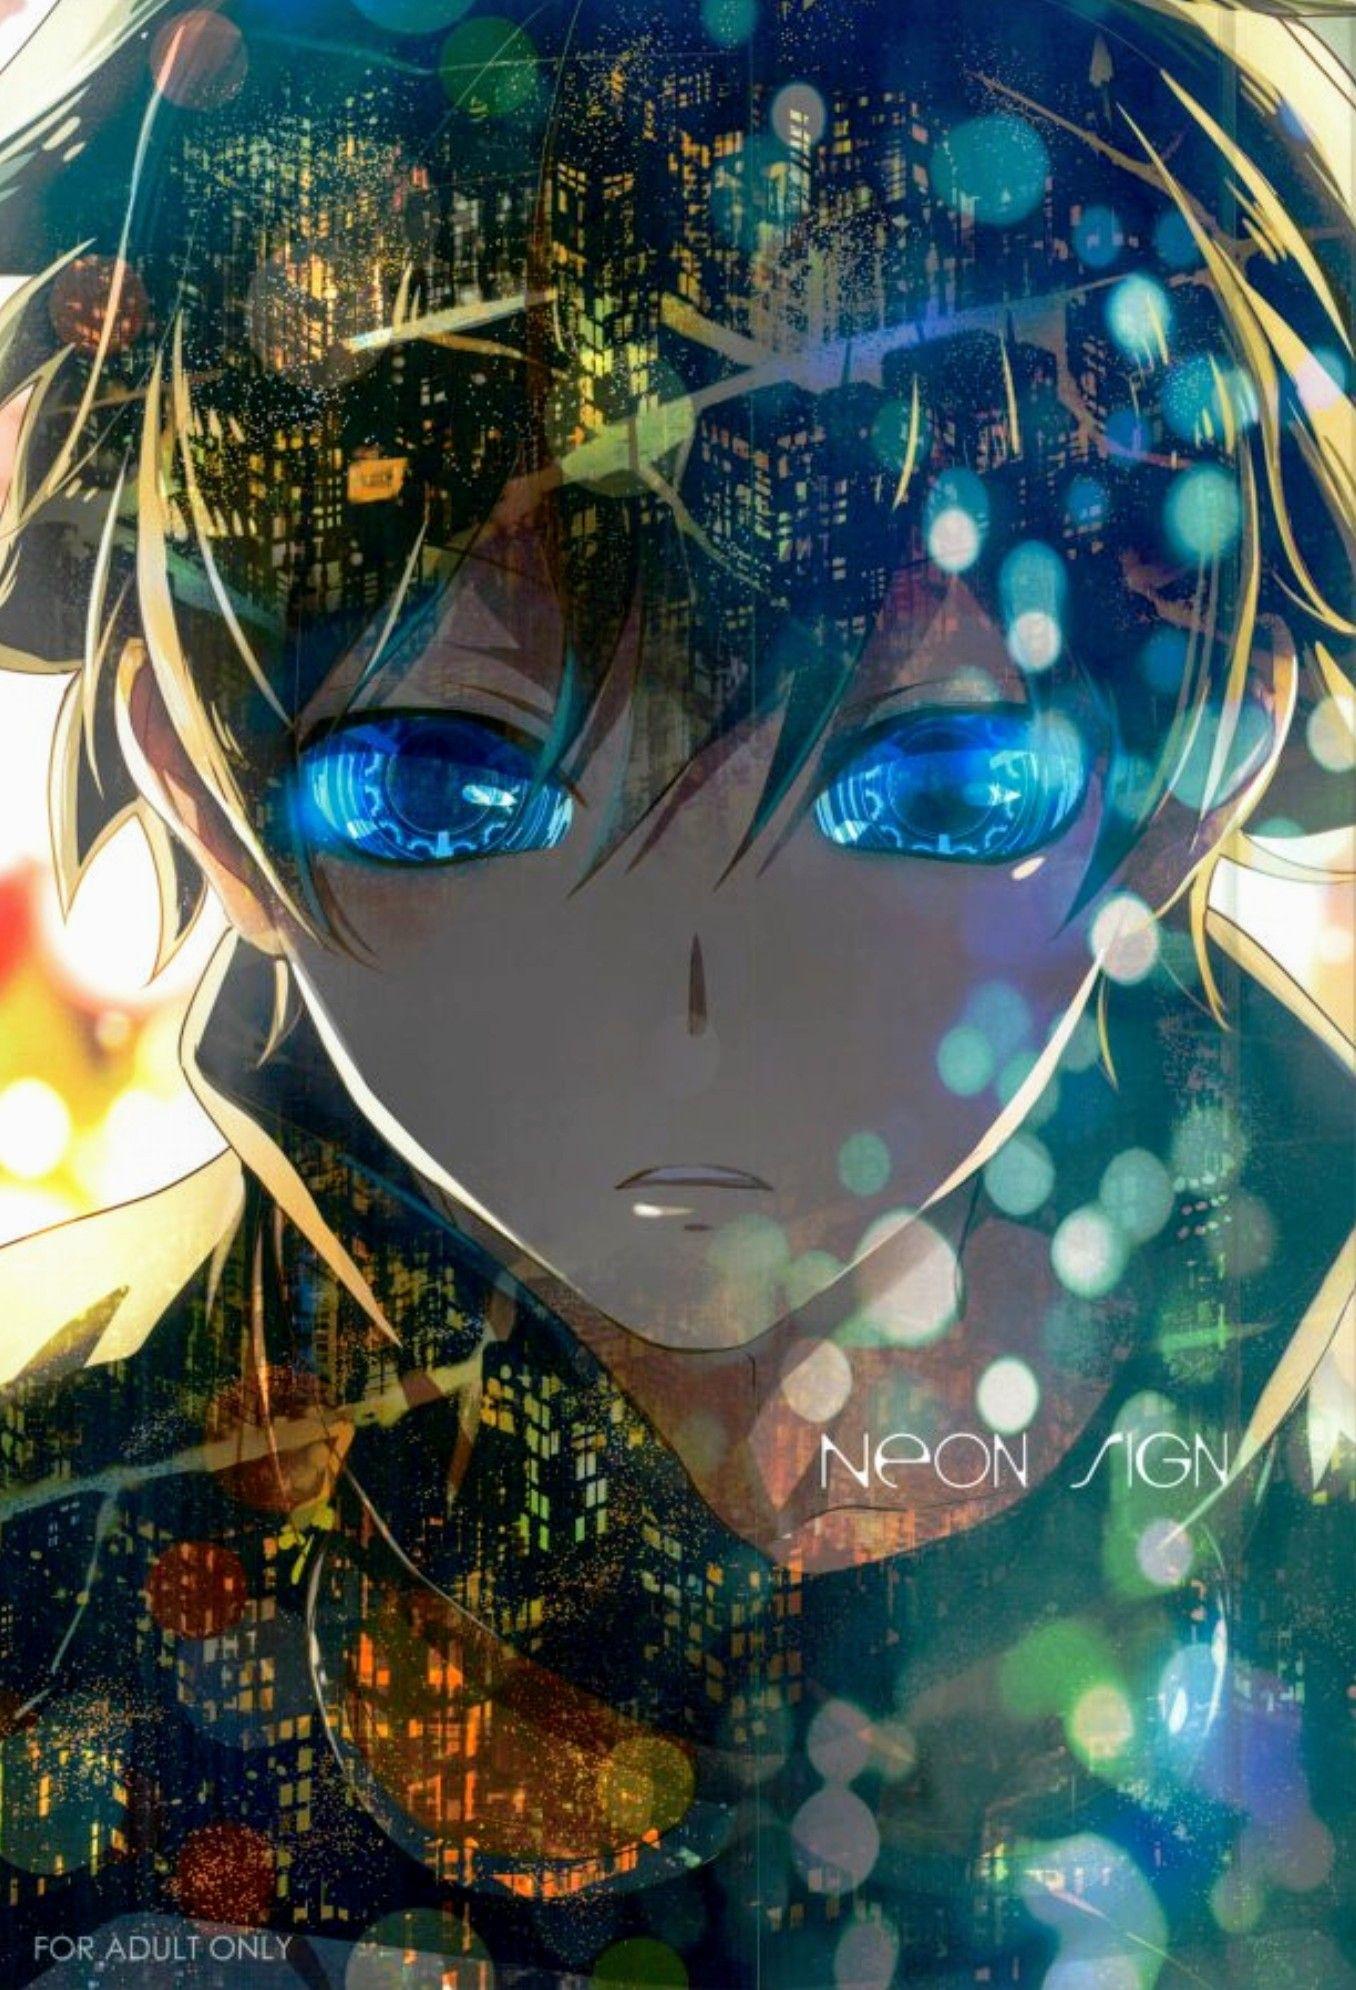 Kekkai Sensen Leonardo Watch Anime, Anime art, Anime